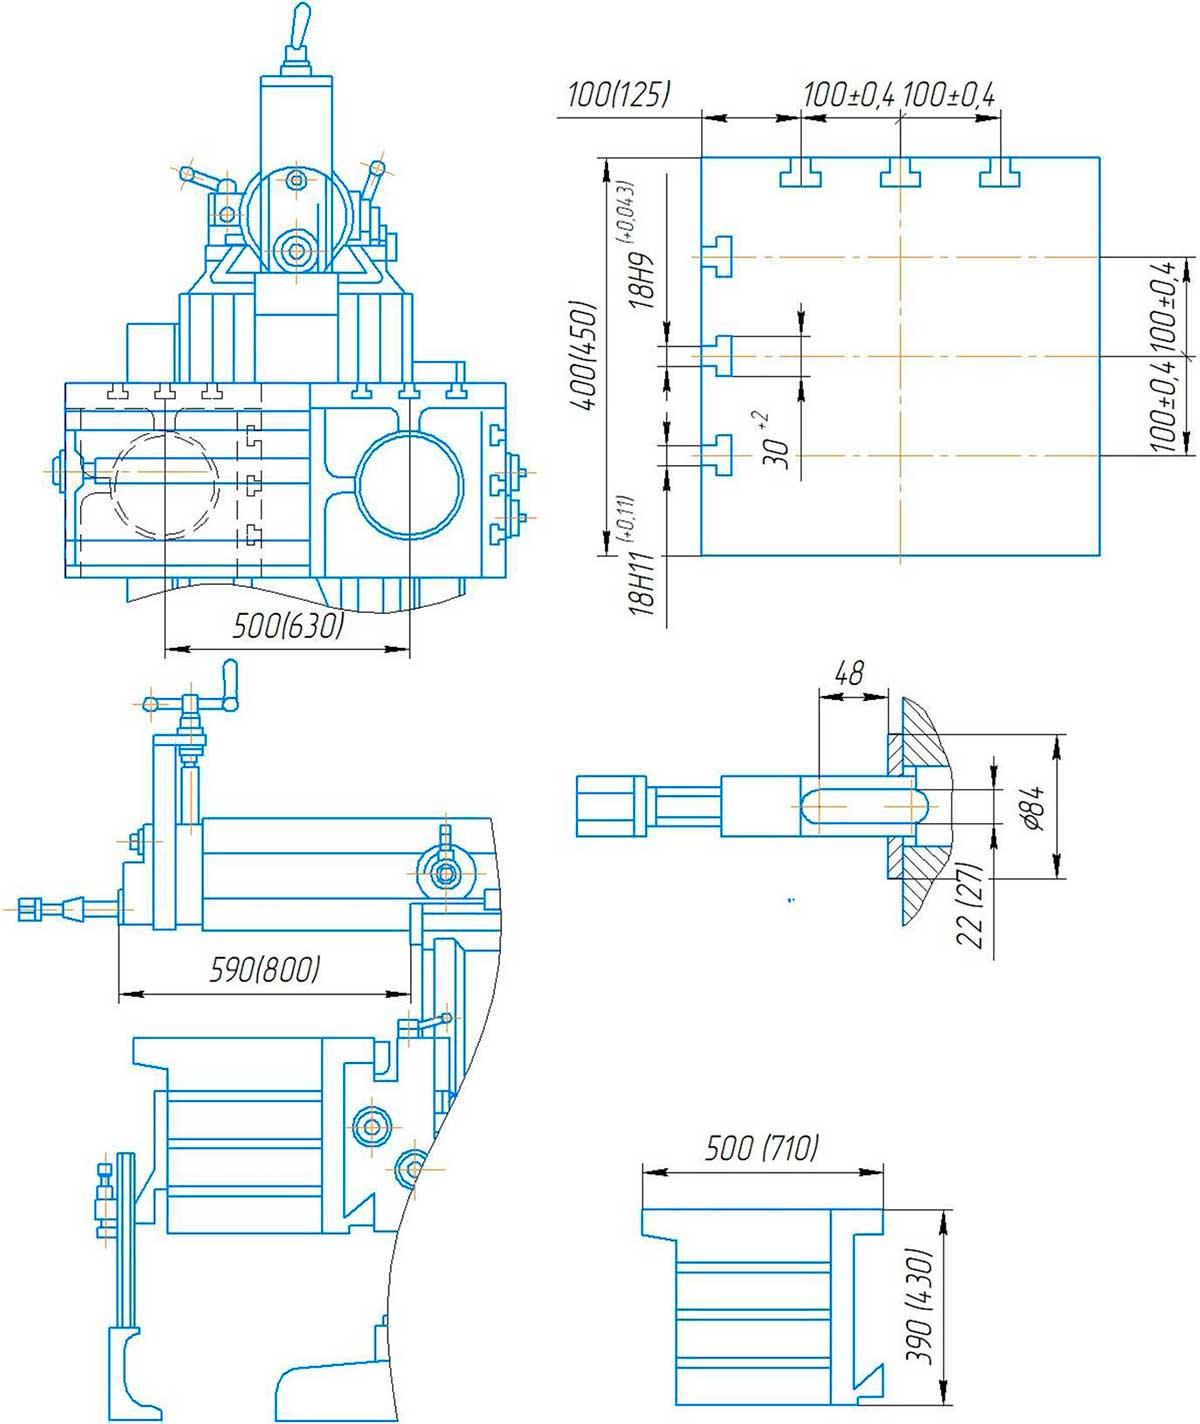 Коробка скоростей станка поперечно-строгального 7307ТД